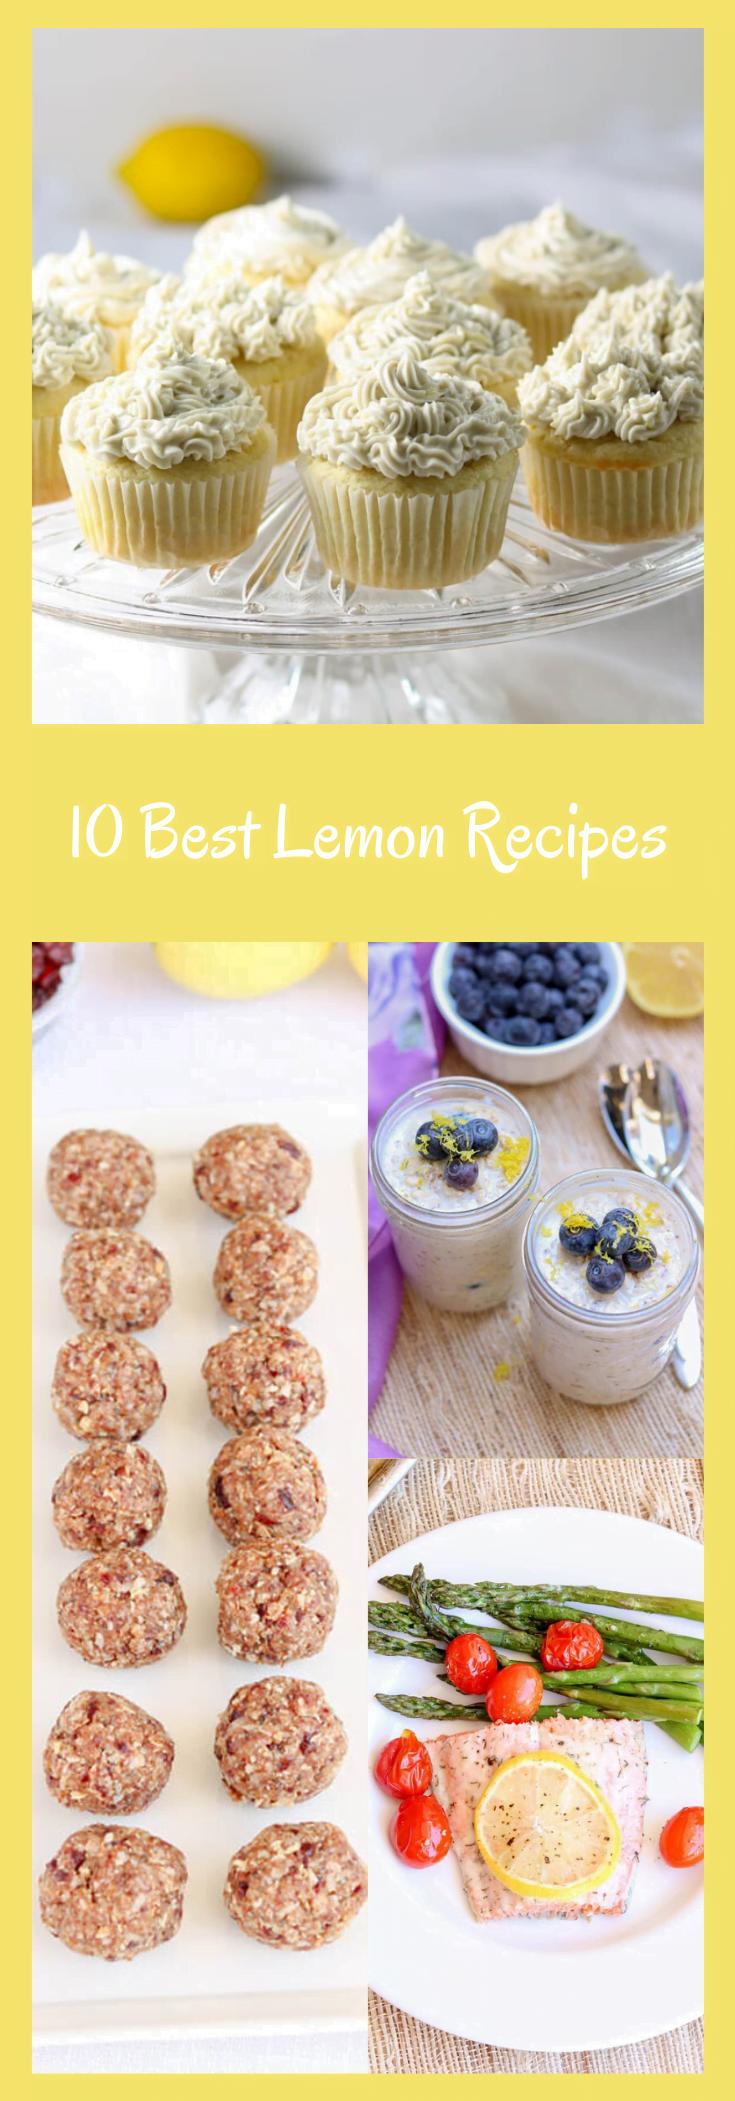 10 Best Lemon Recipes